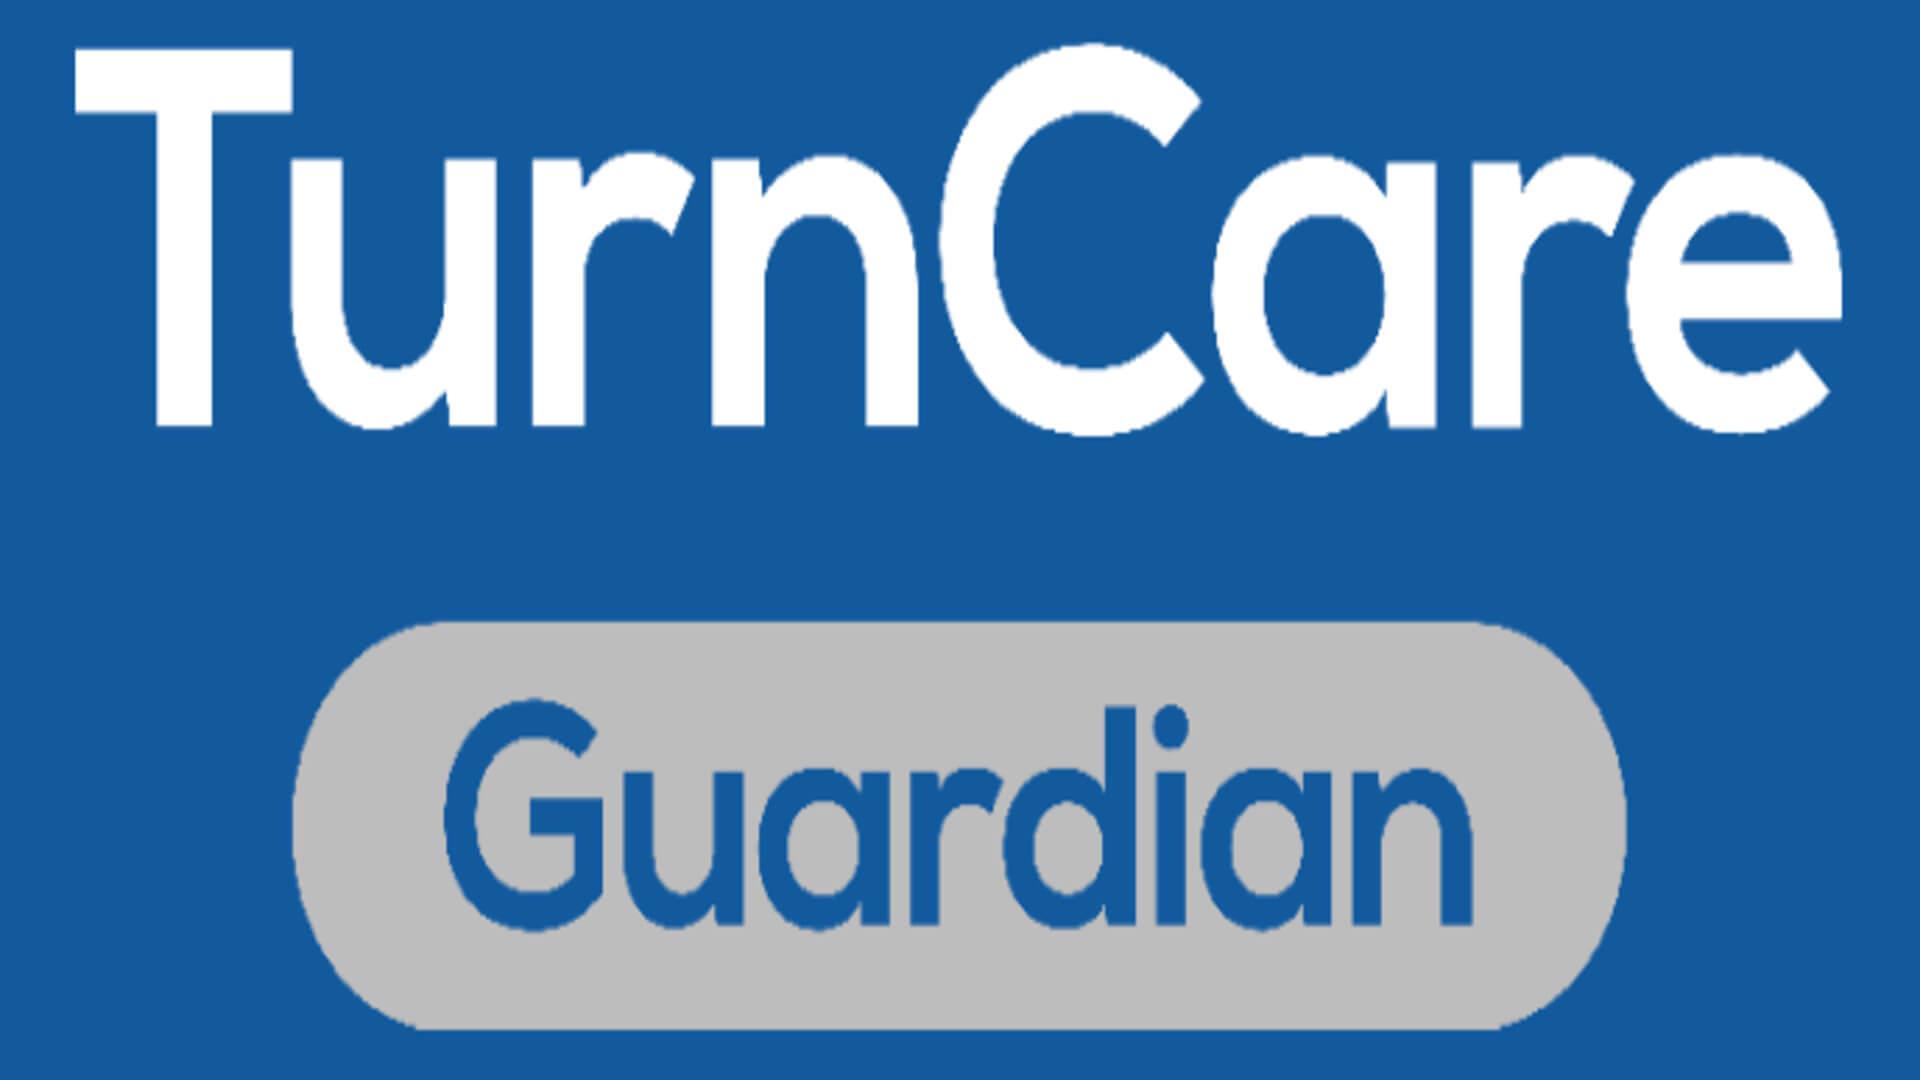 Turncare logo